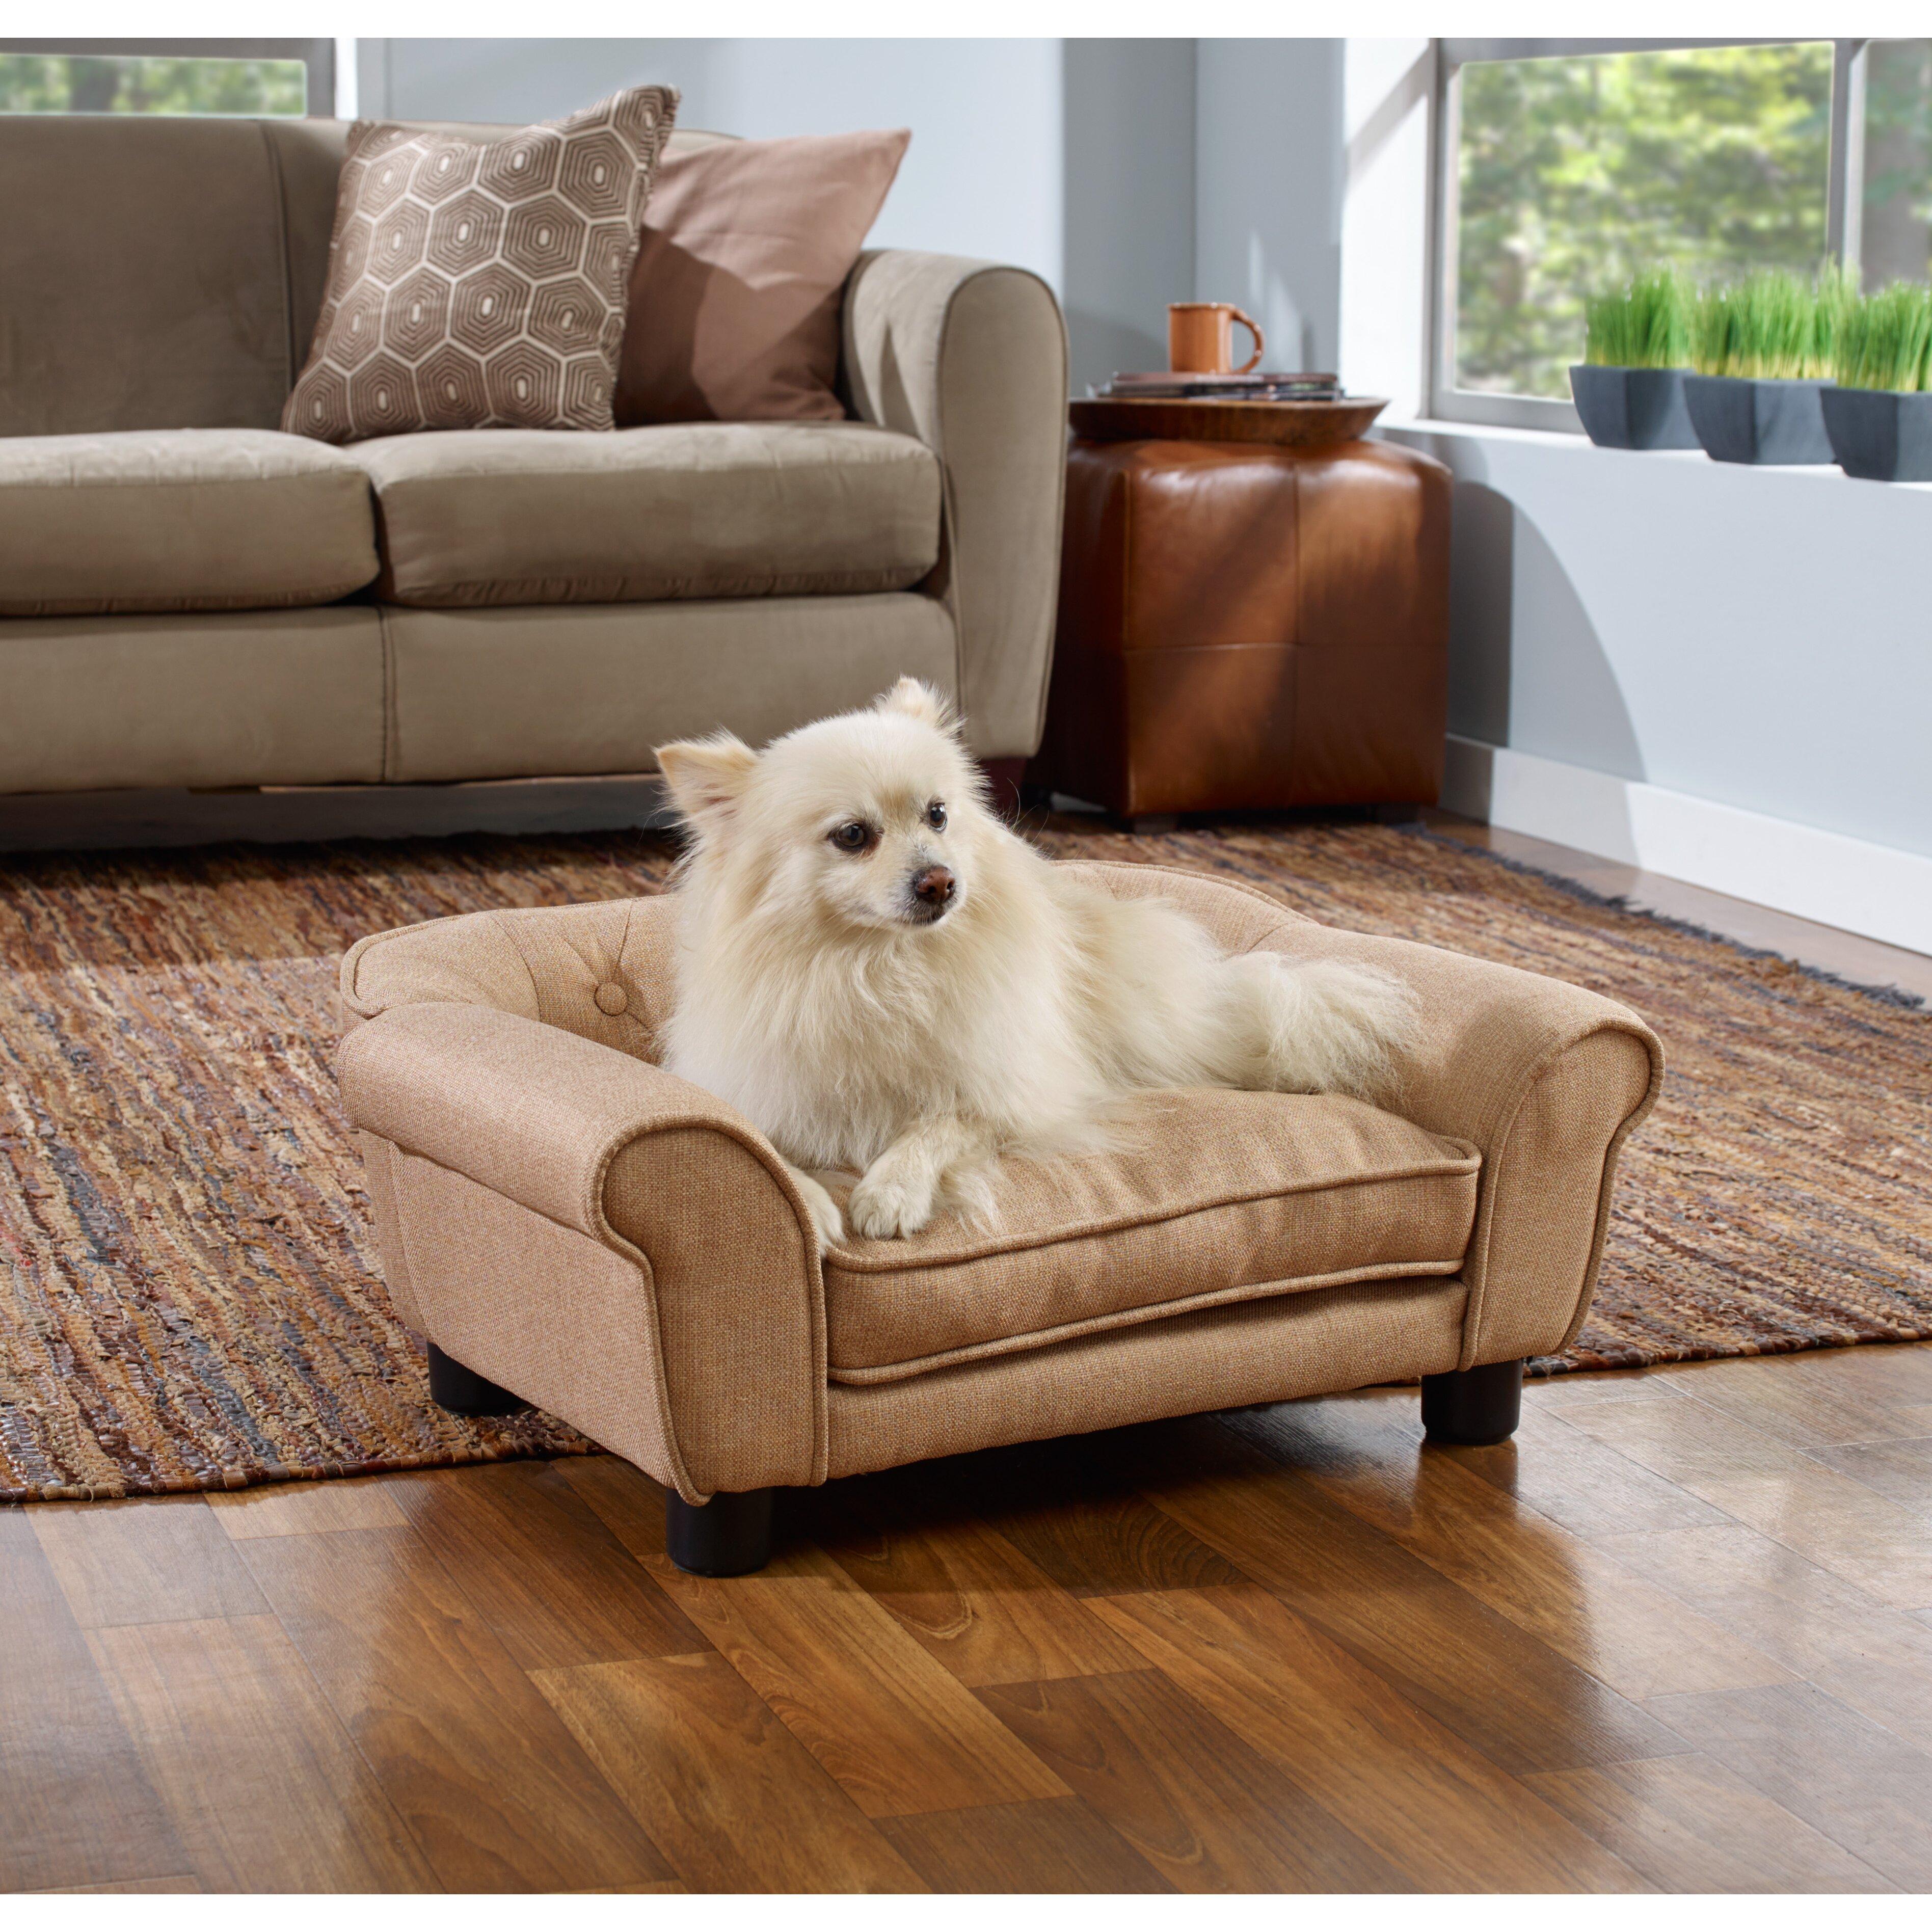 Enchanted Home Pet Sydney Sofa Dog Bed Reviews Wayfair